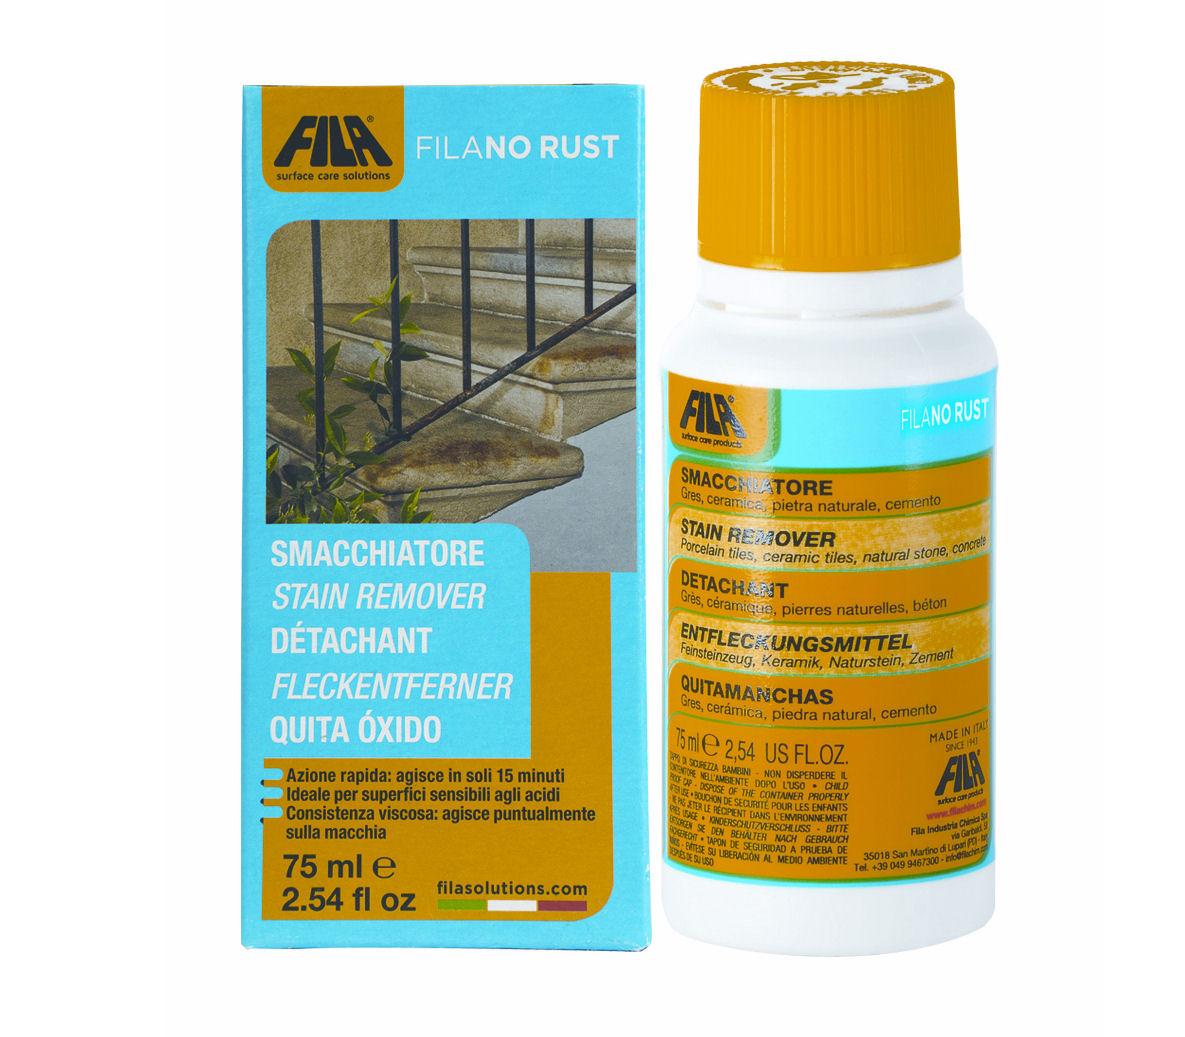 Fila No Rust | Stain Remover for Rust Marks Tiles | Mandarin Stone